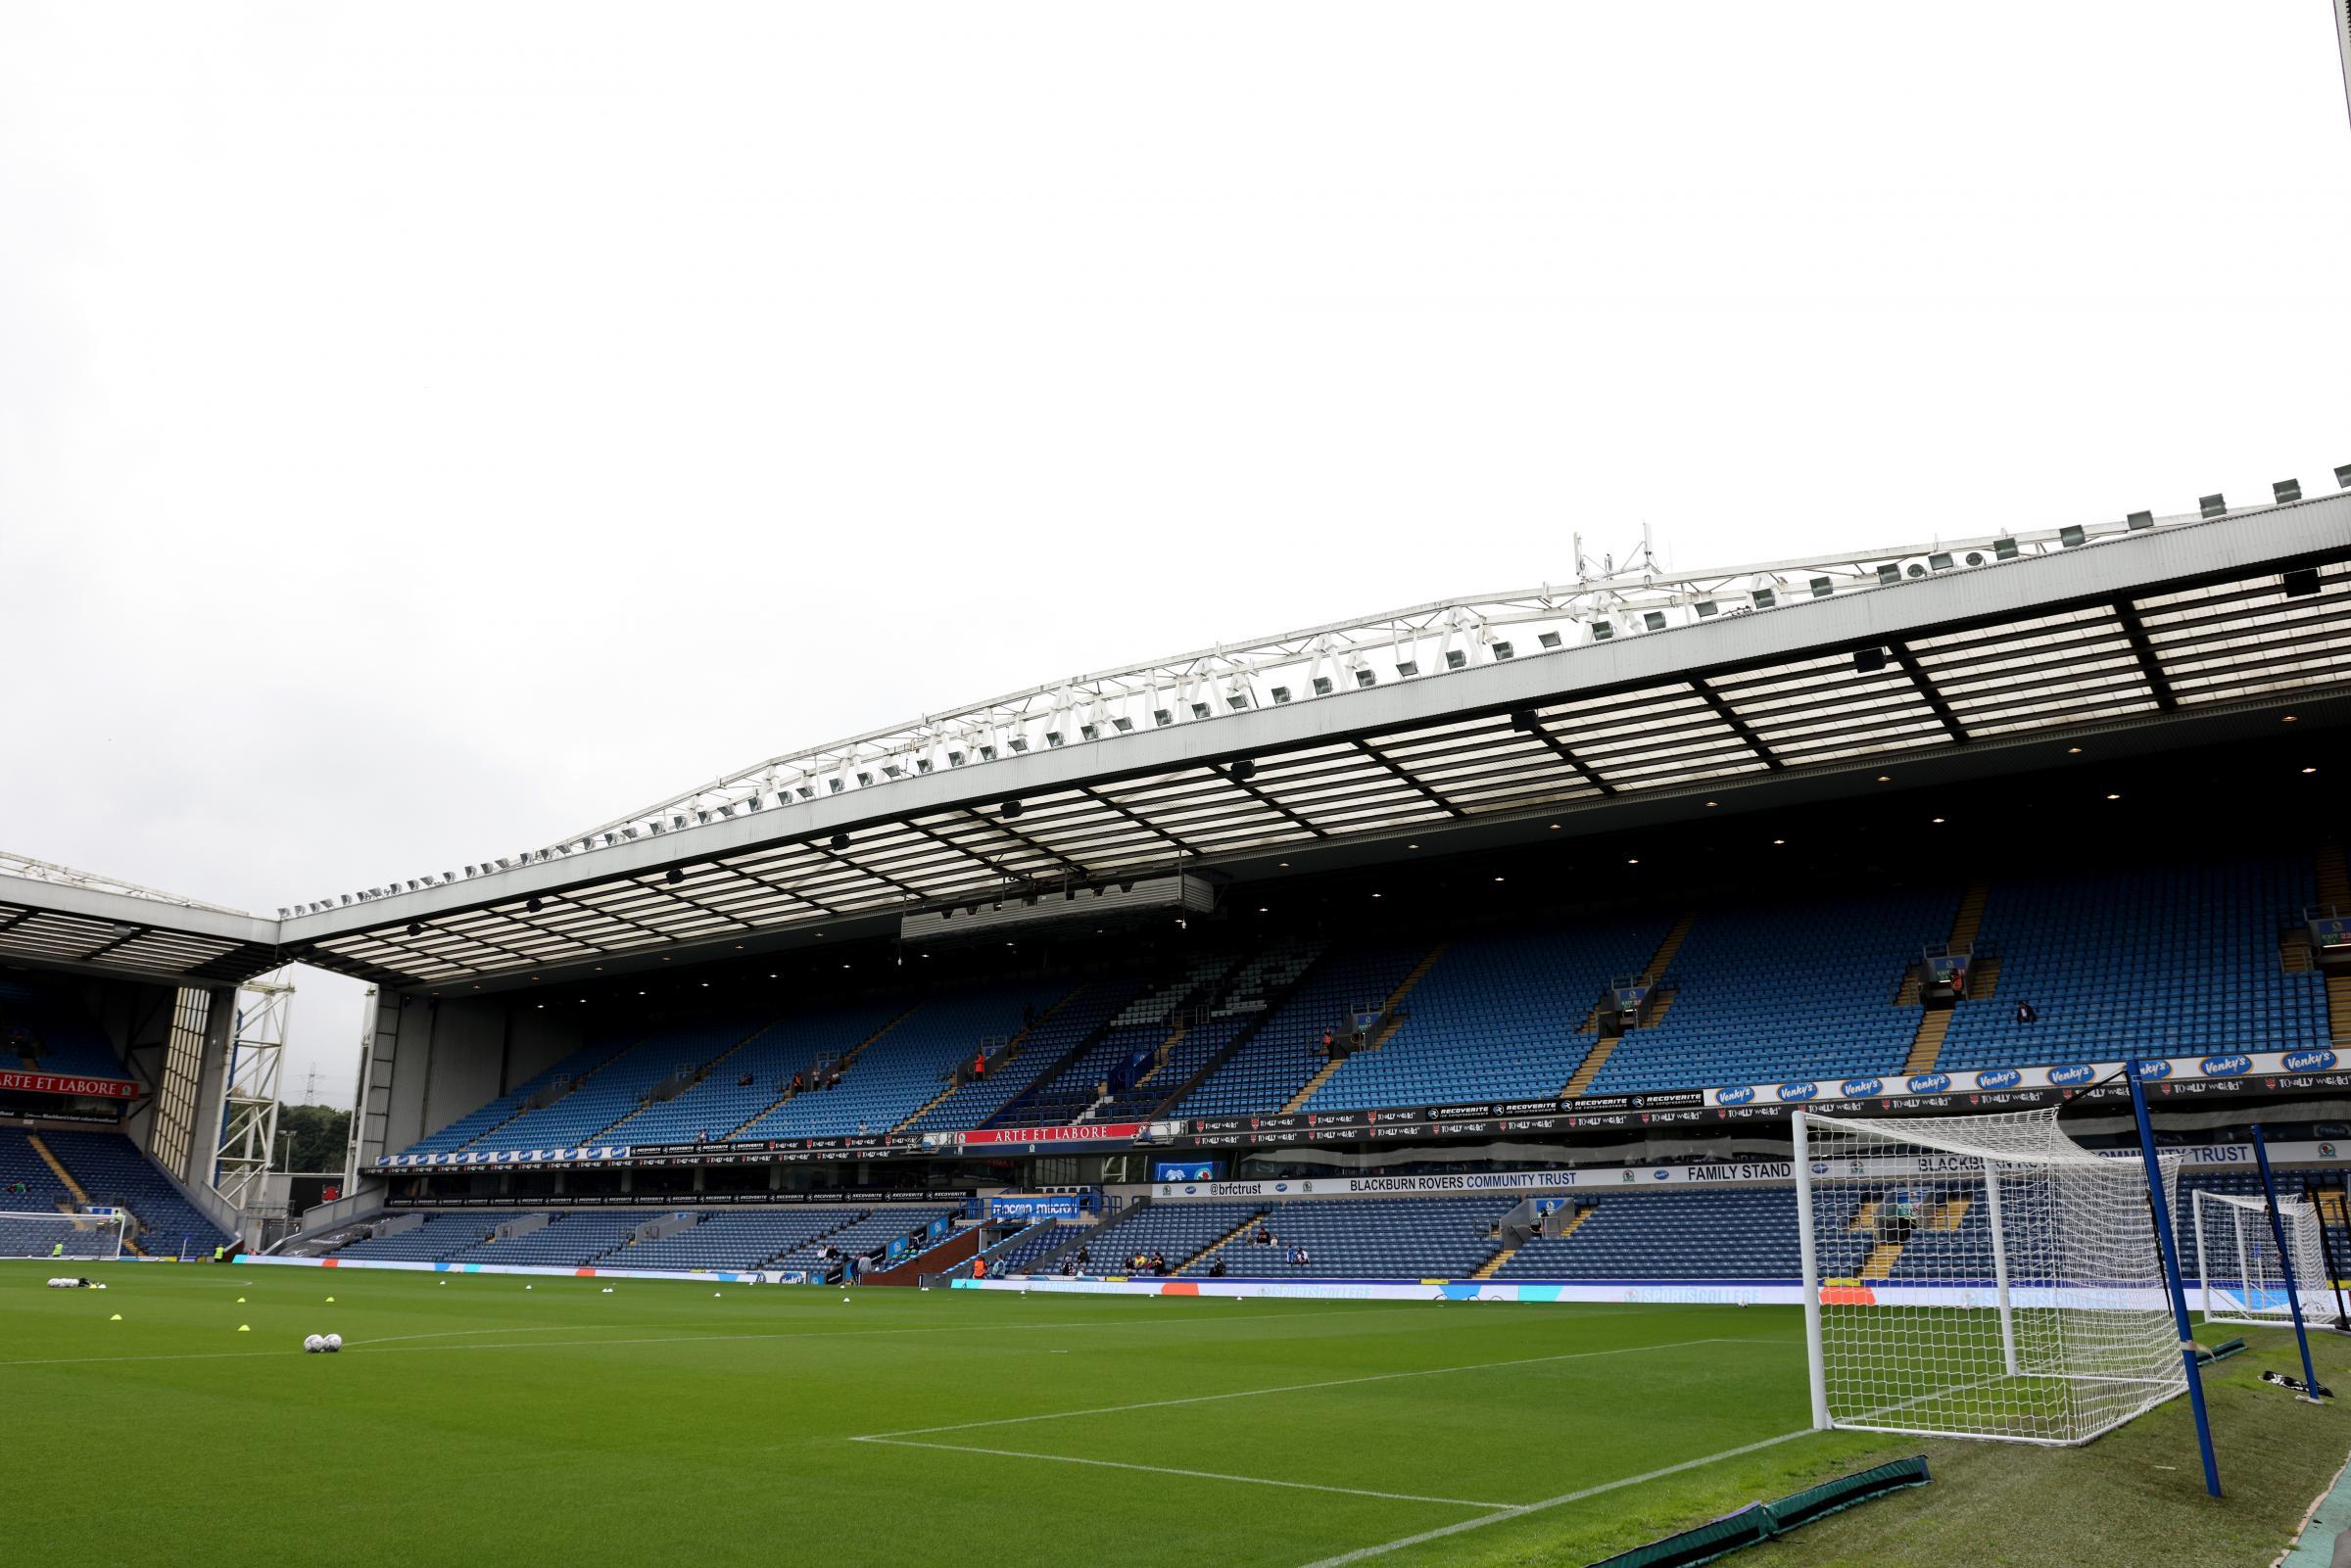 Blackburn Rovers v Coventry City: Cara menonton di TV, streaming langsung |  Jadwal BRFC